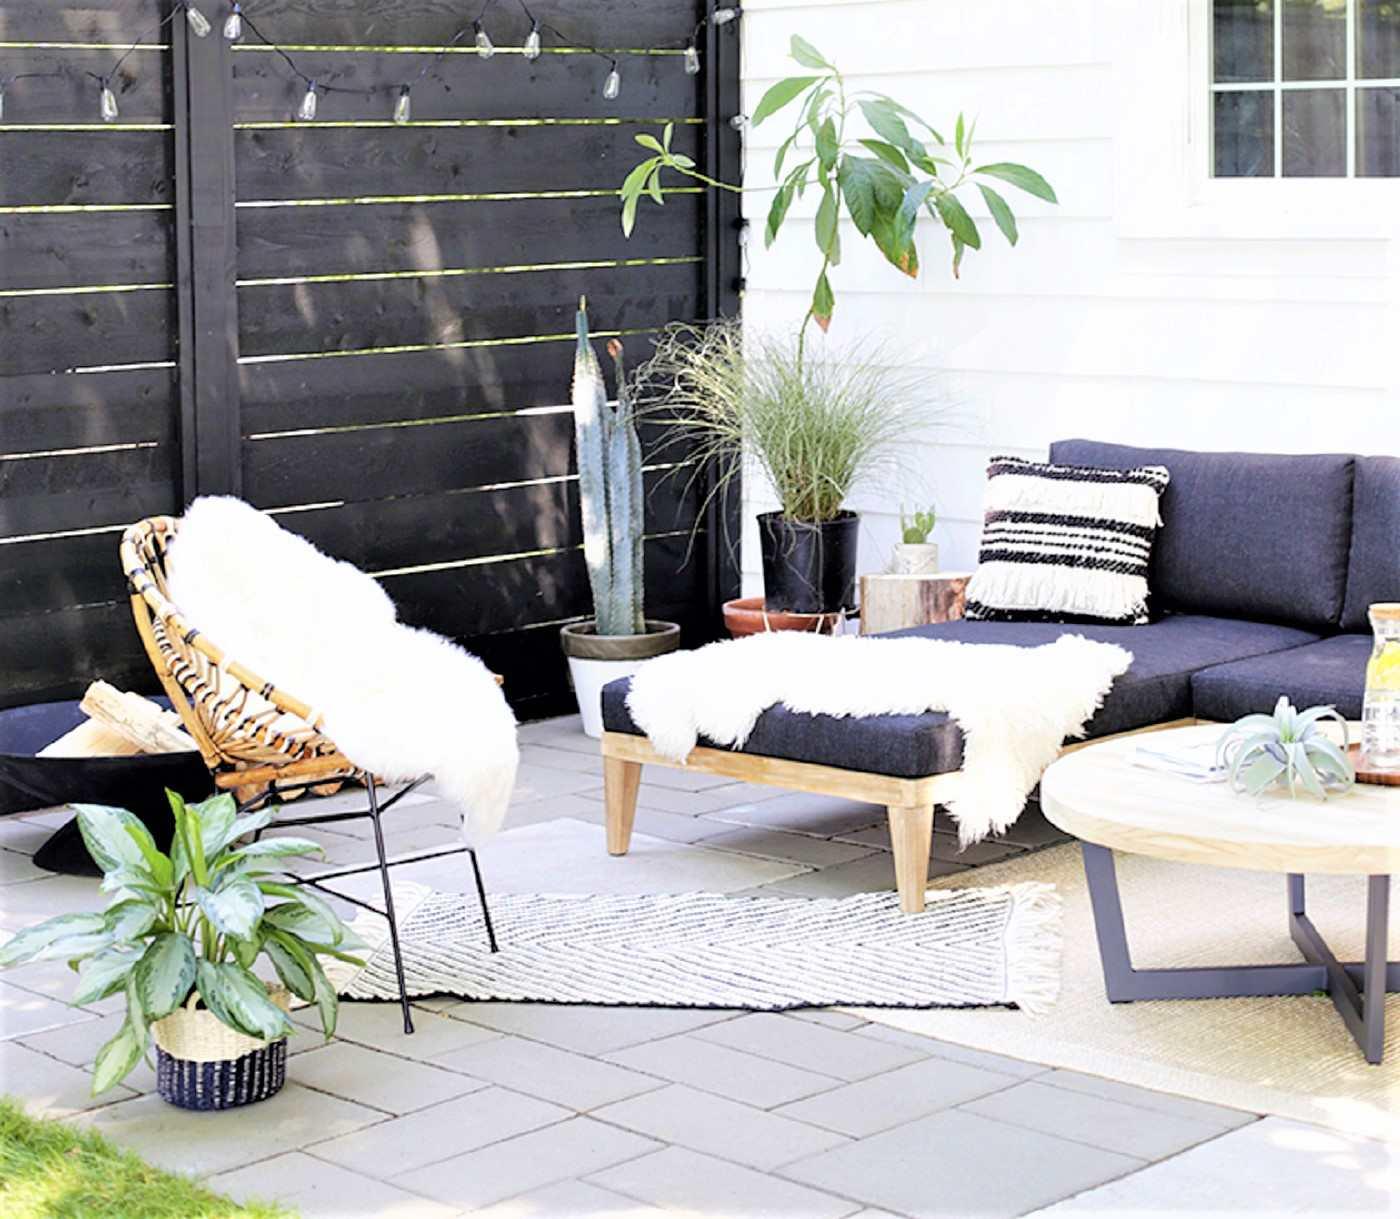 Modern-style DIY patio